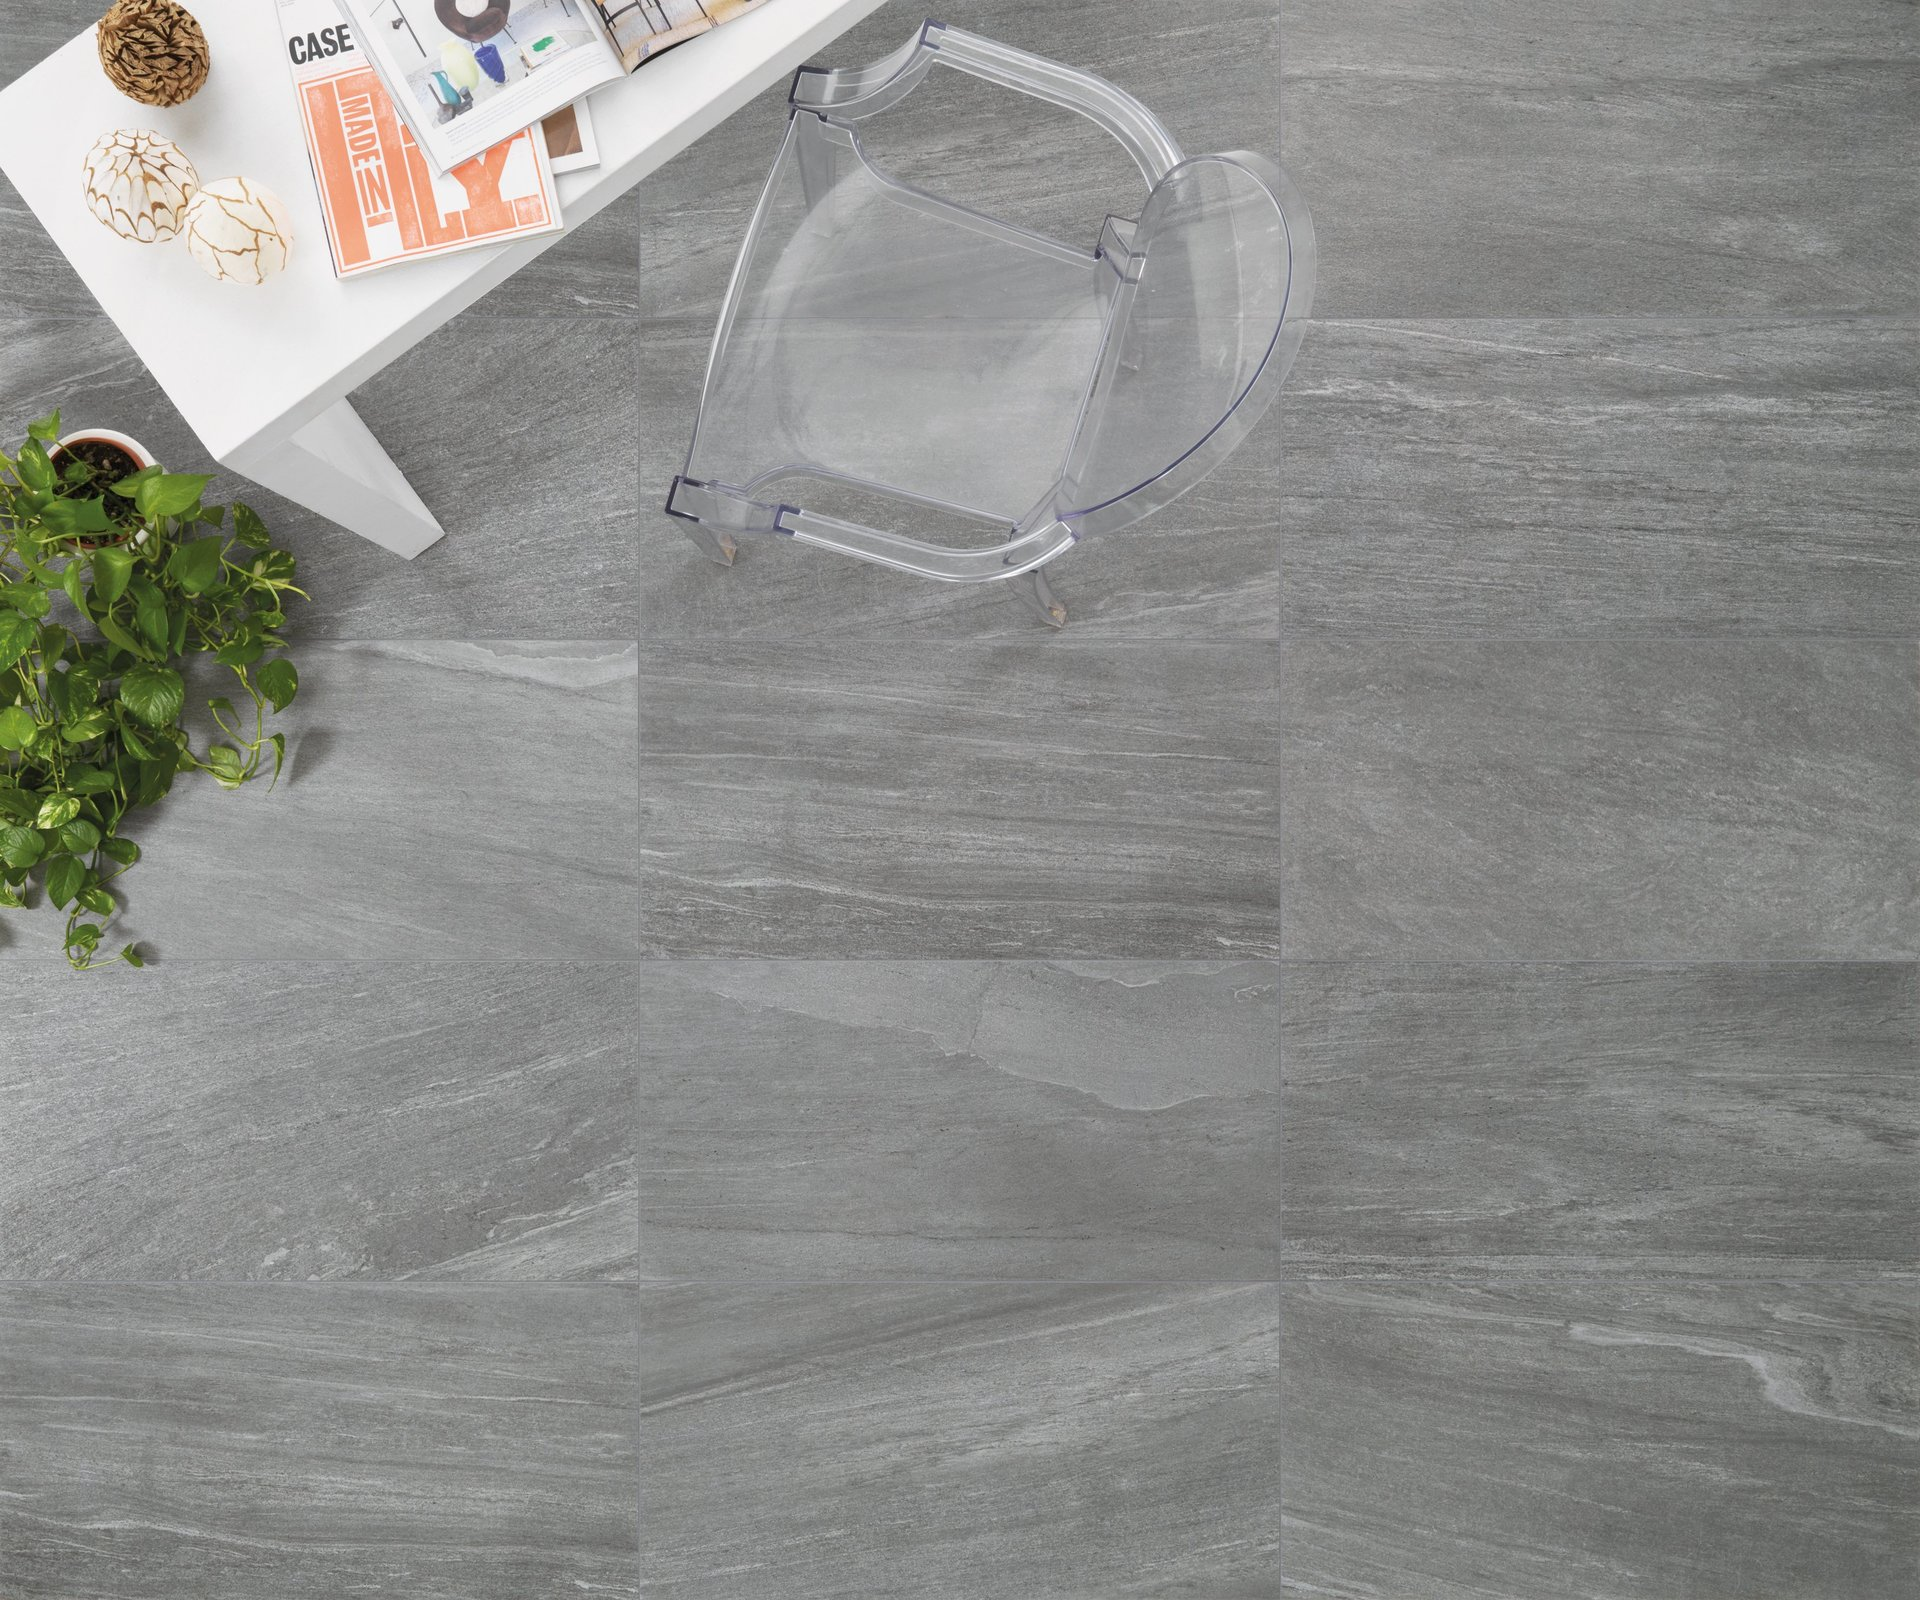 Marble Flooring Essex: Tiling Accessories In Hornchurch, Essex